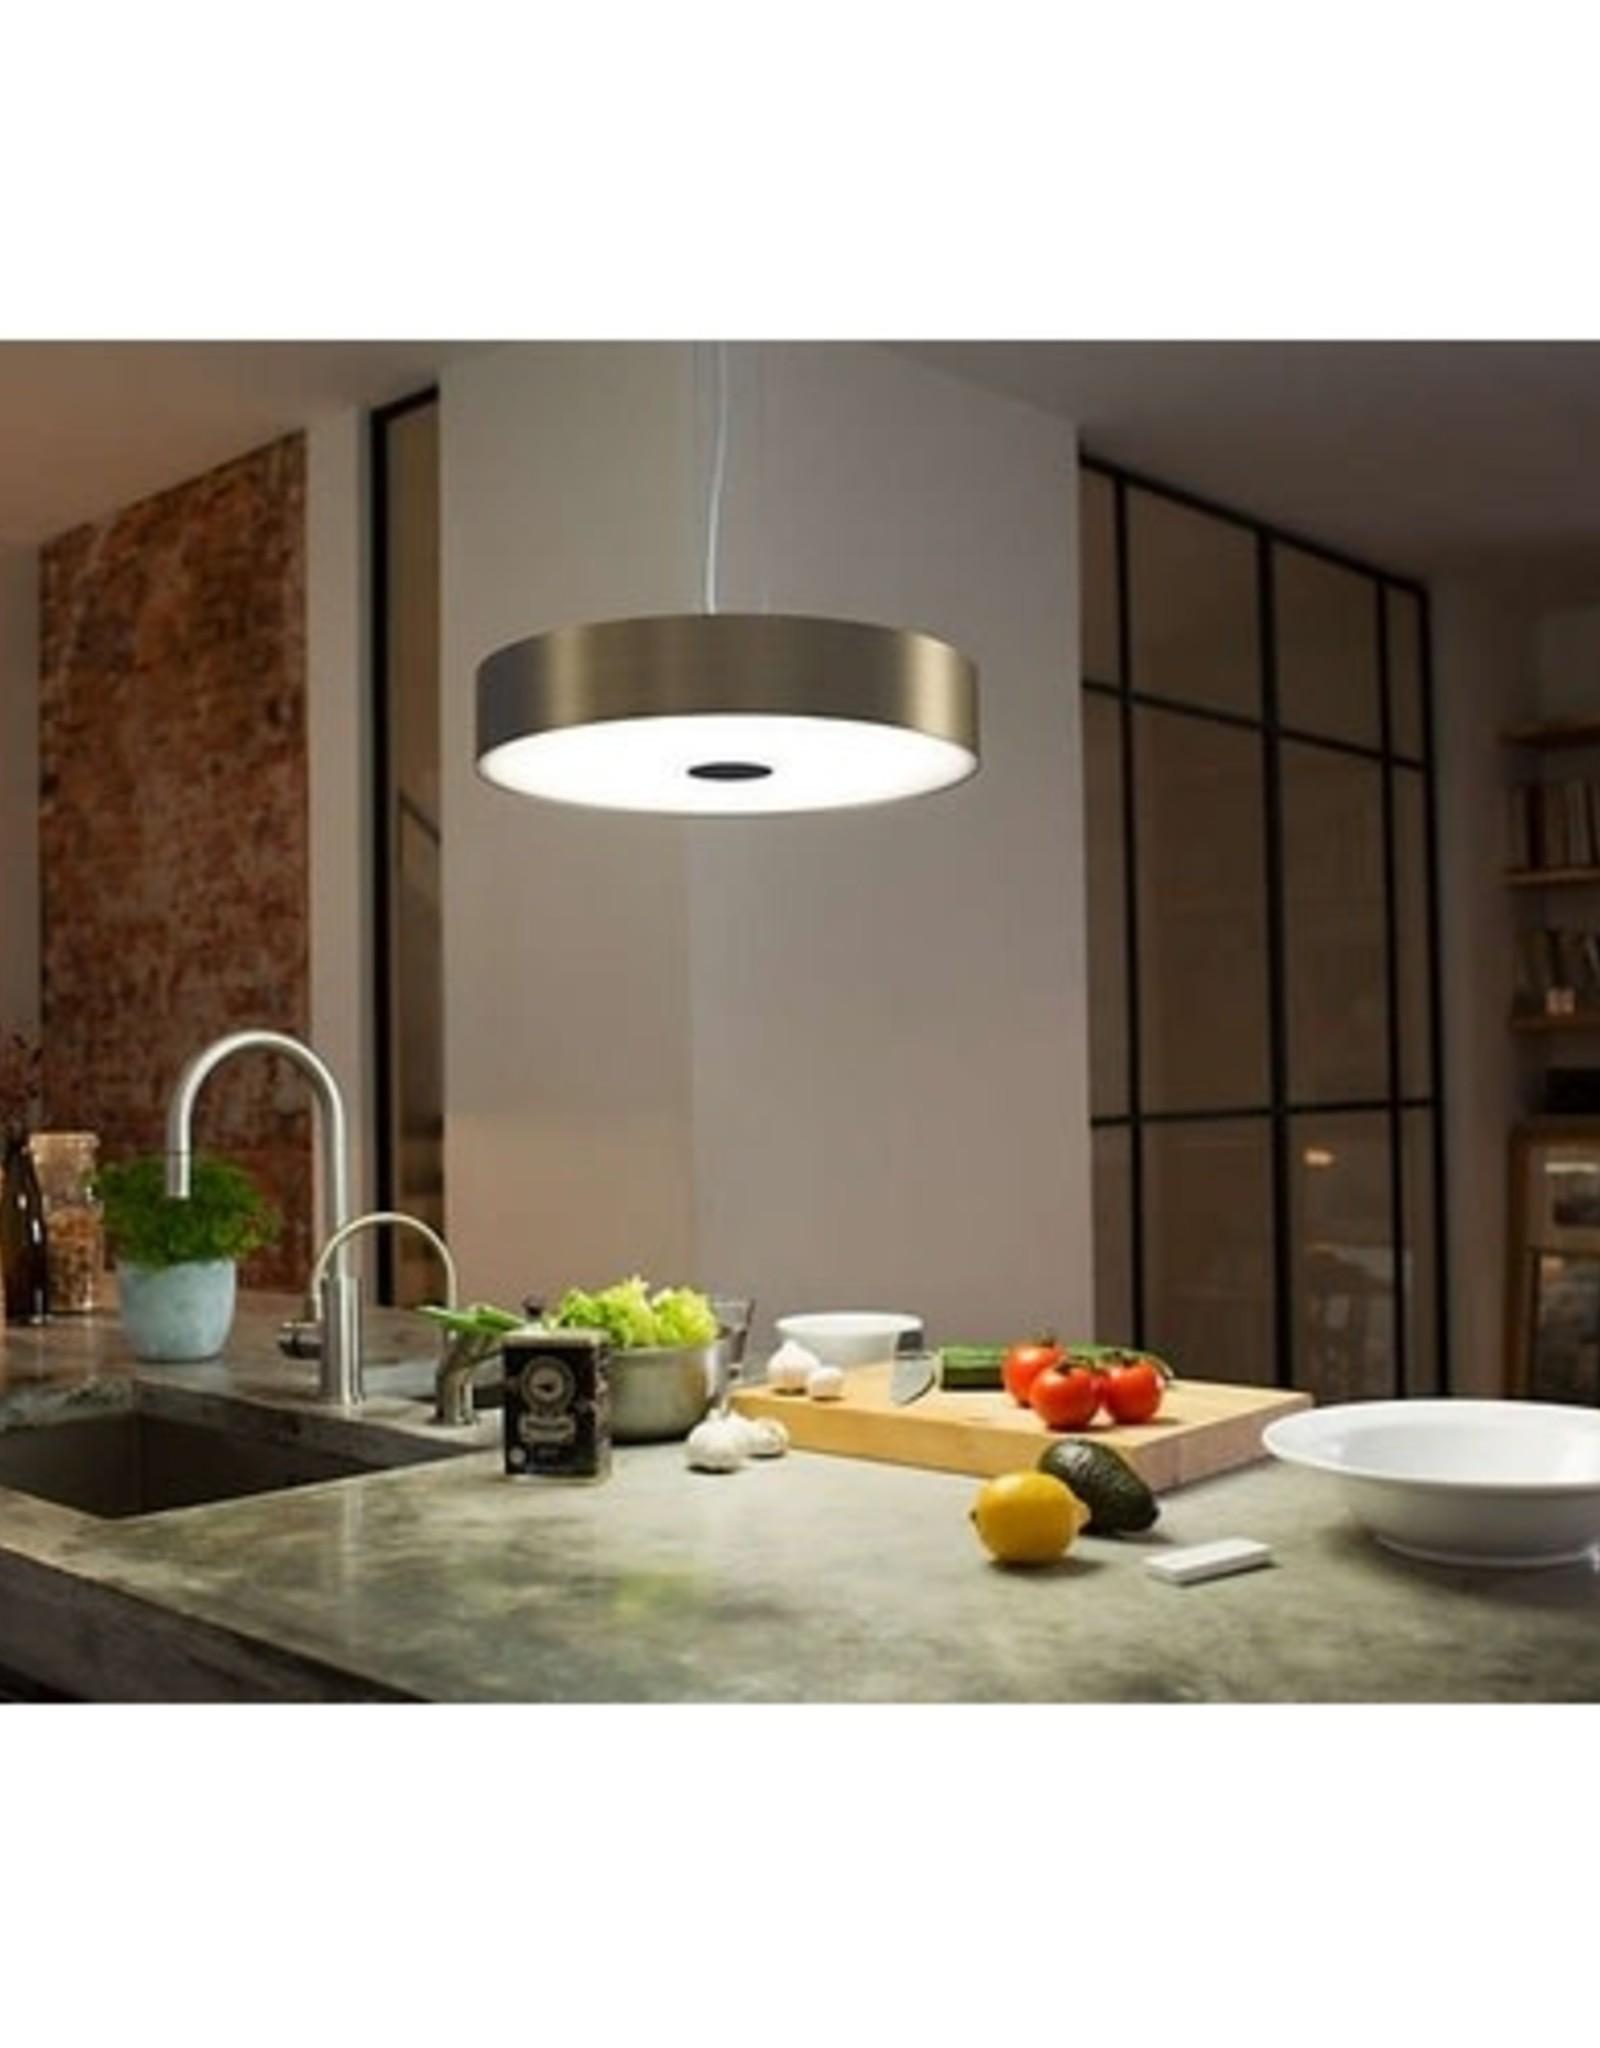 Philips Hue Philips Hue | Huefair Pendant Aluminium White Ambiance Light | 4100348u7